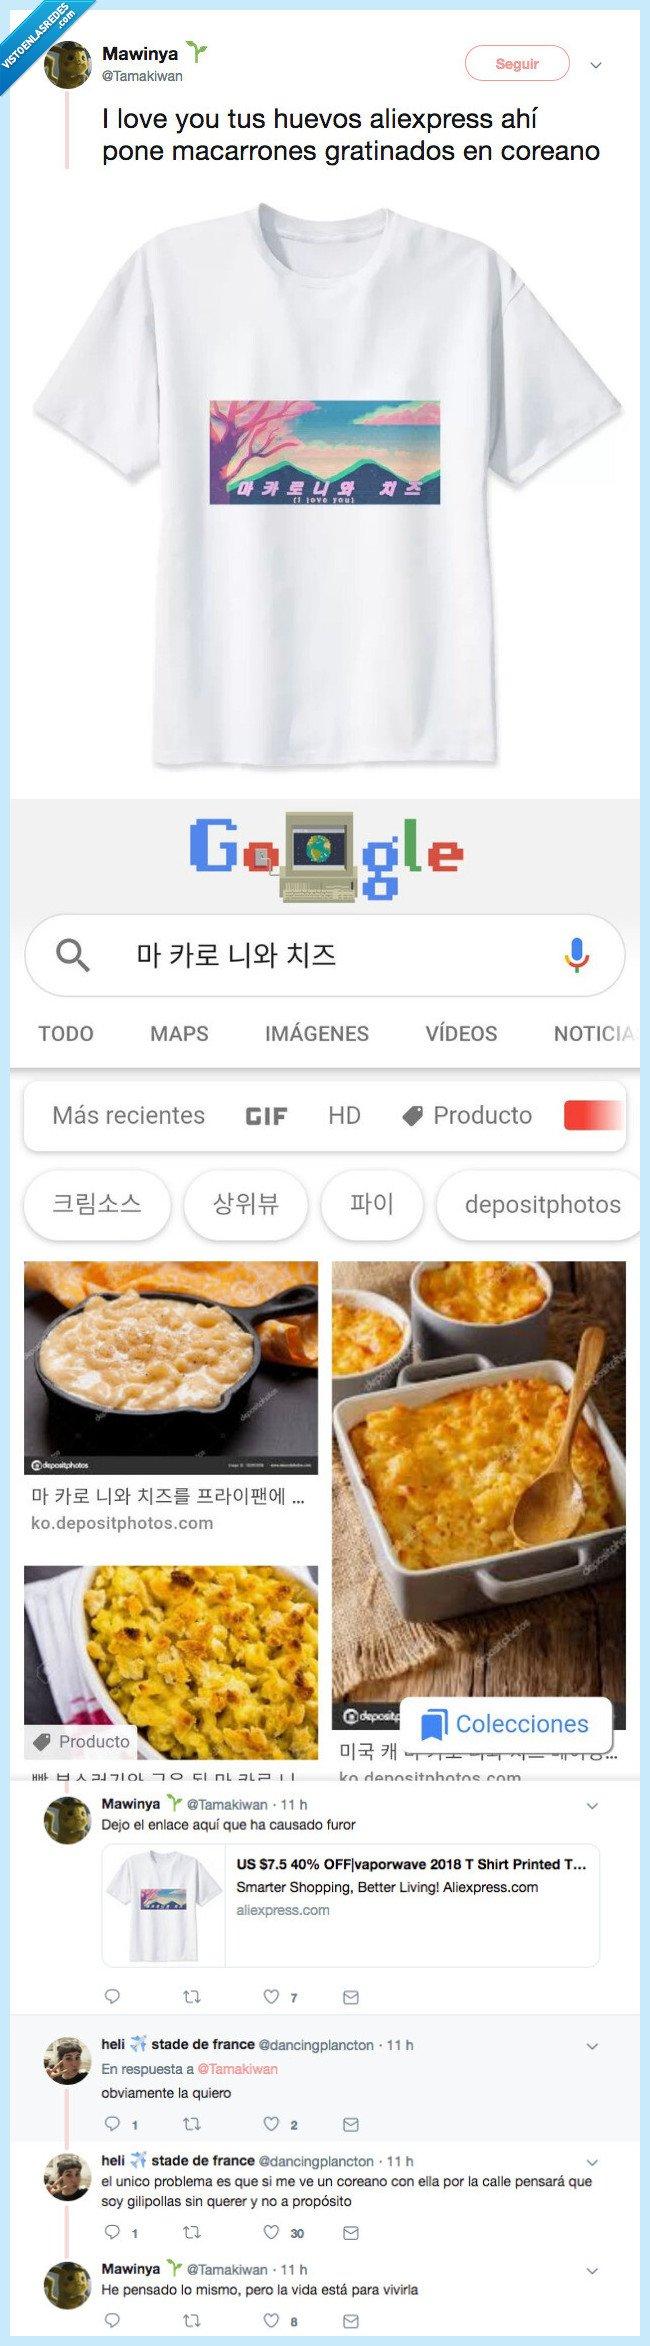 coreano,gratinados,macarrones